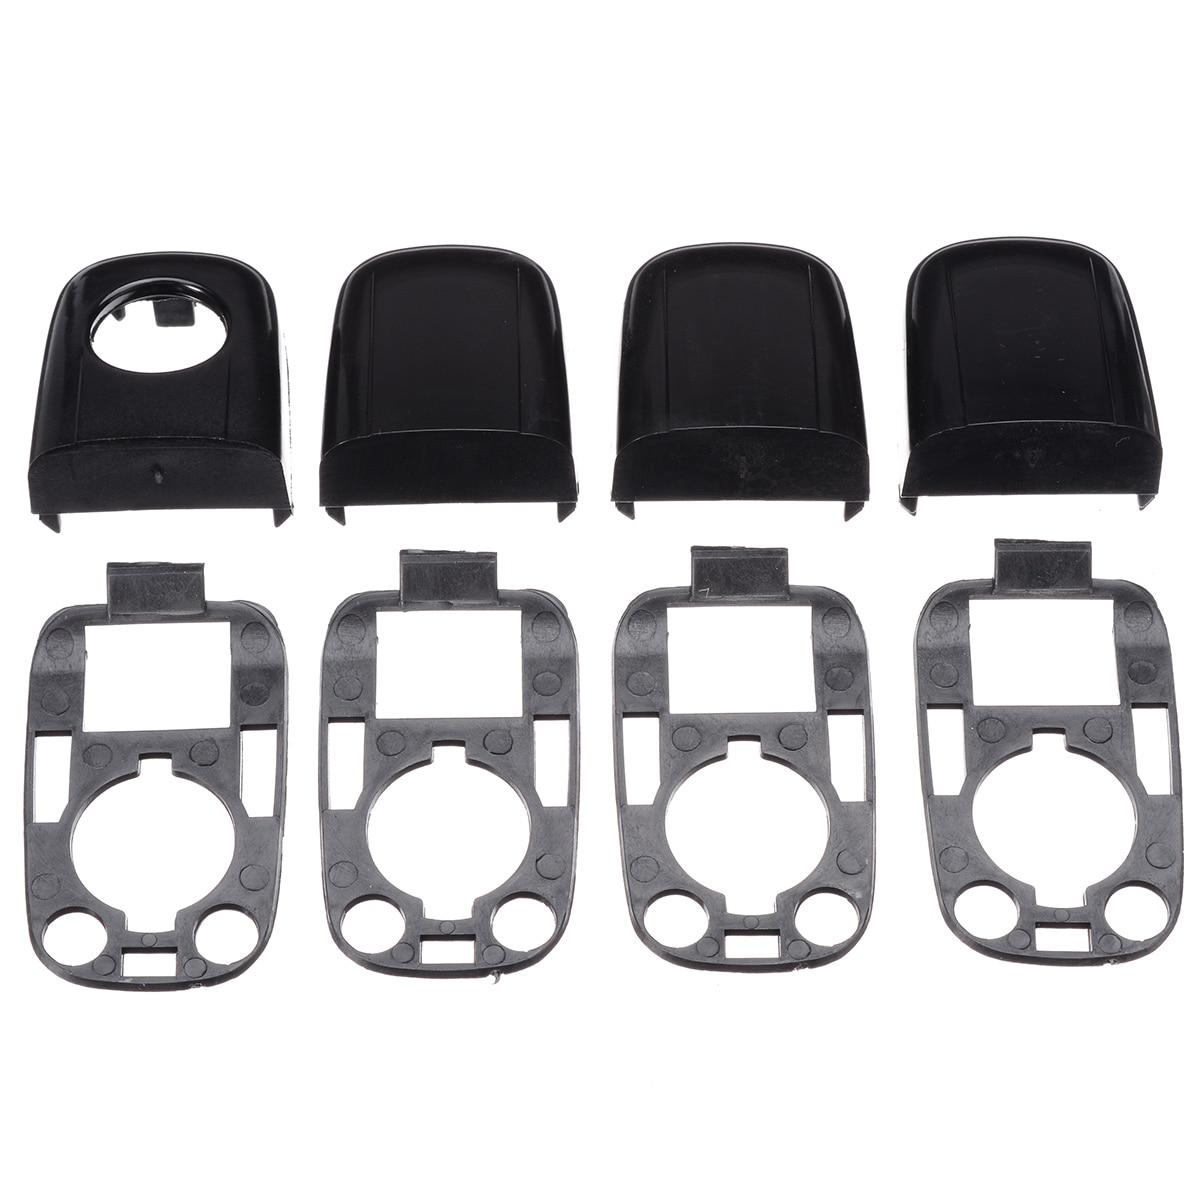 8 Stks/set Links Rechts Auto Deurgreep Cover End Cap Beschermende Lock Cover Accessoires Voor Peugeot 307/Citroen C2 c3